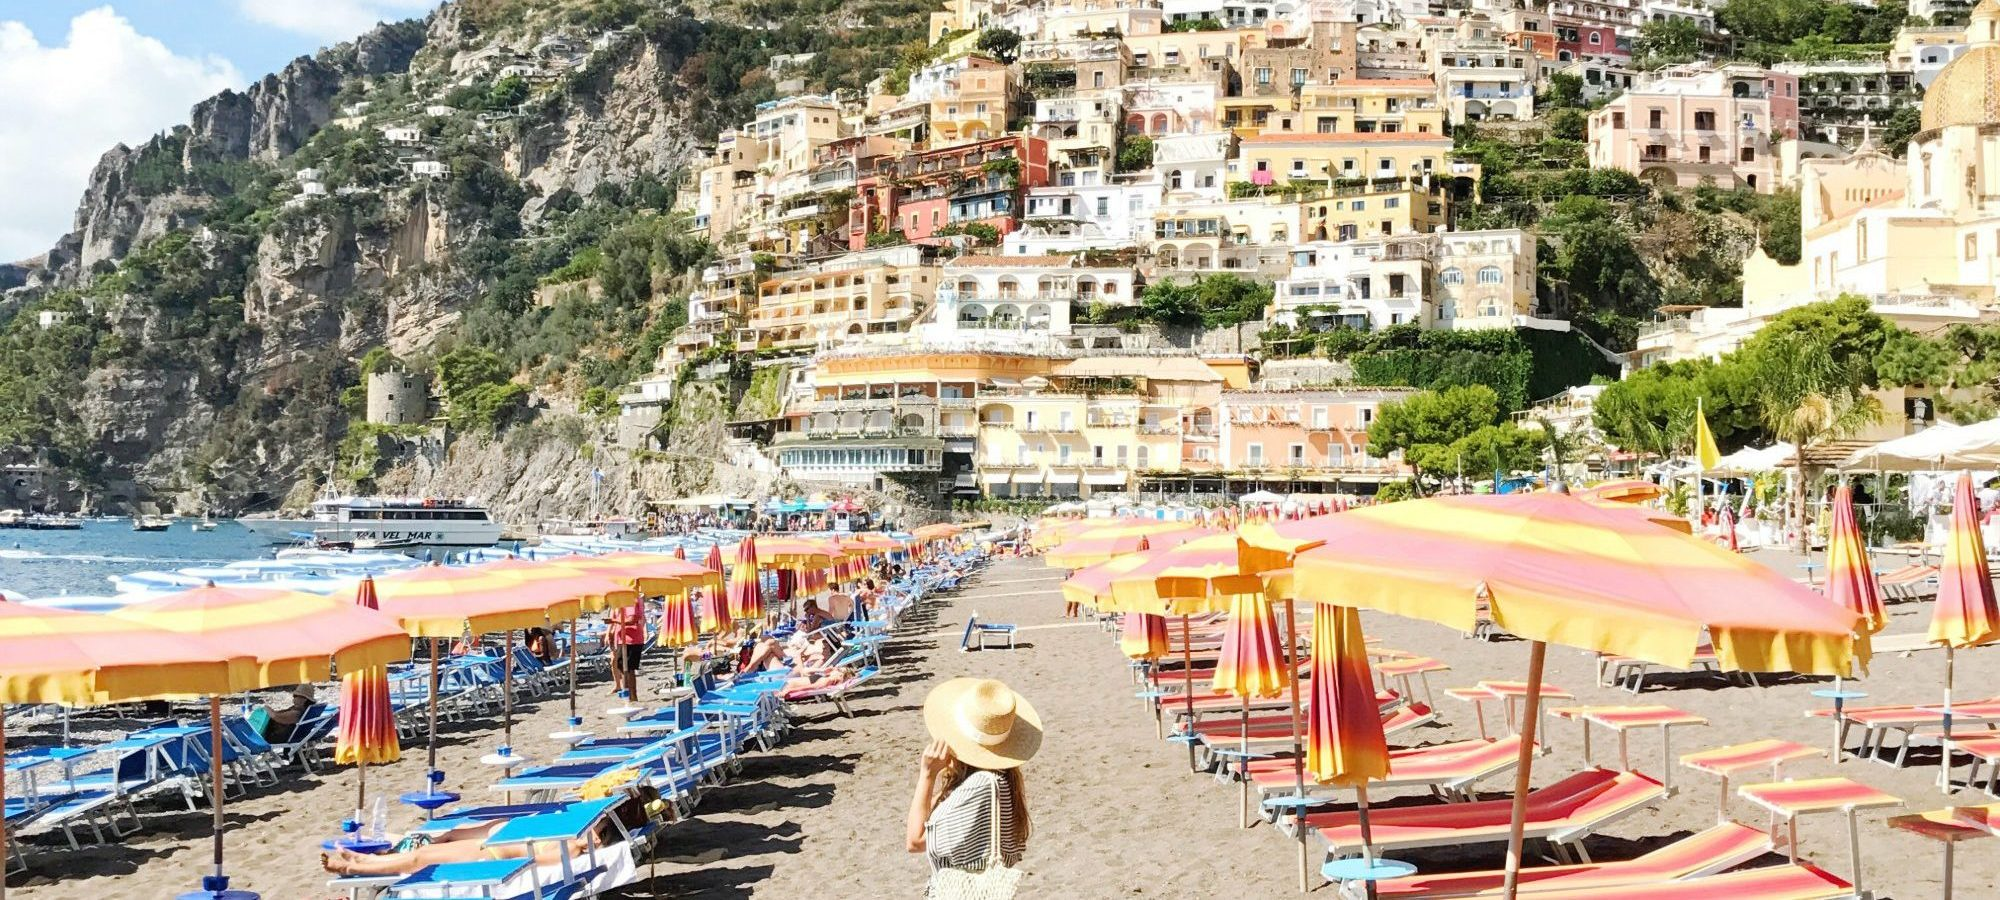 Destination Guide To The Amalfi Coast Passport Magazine